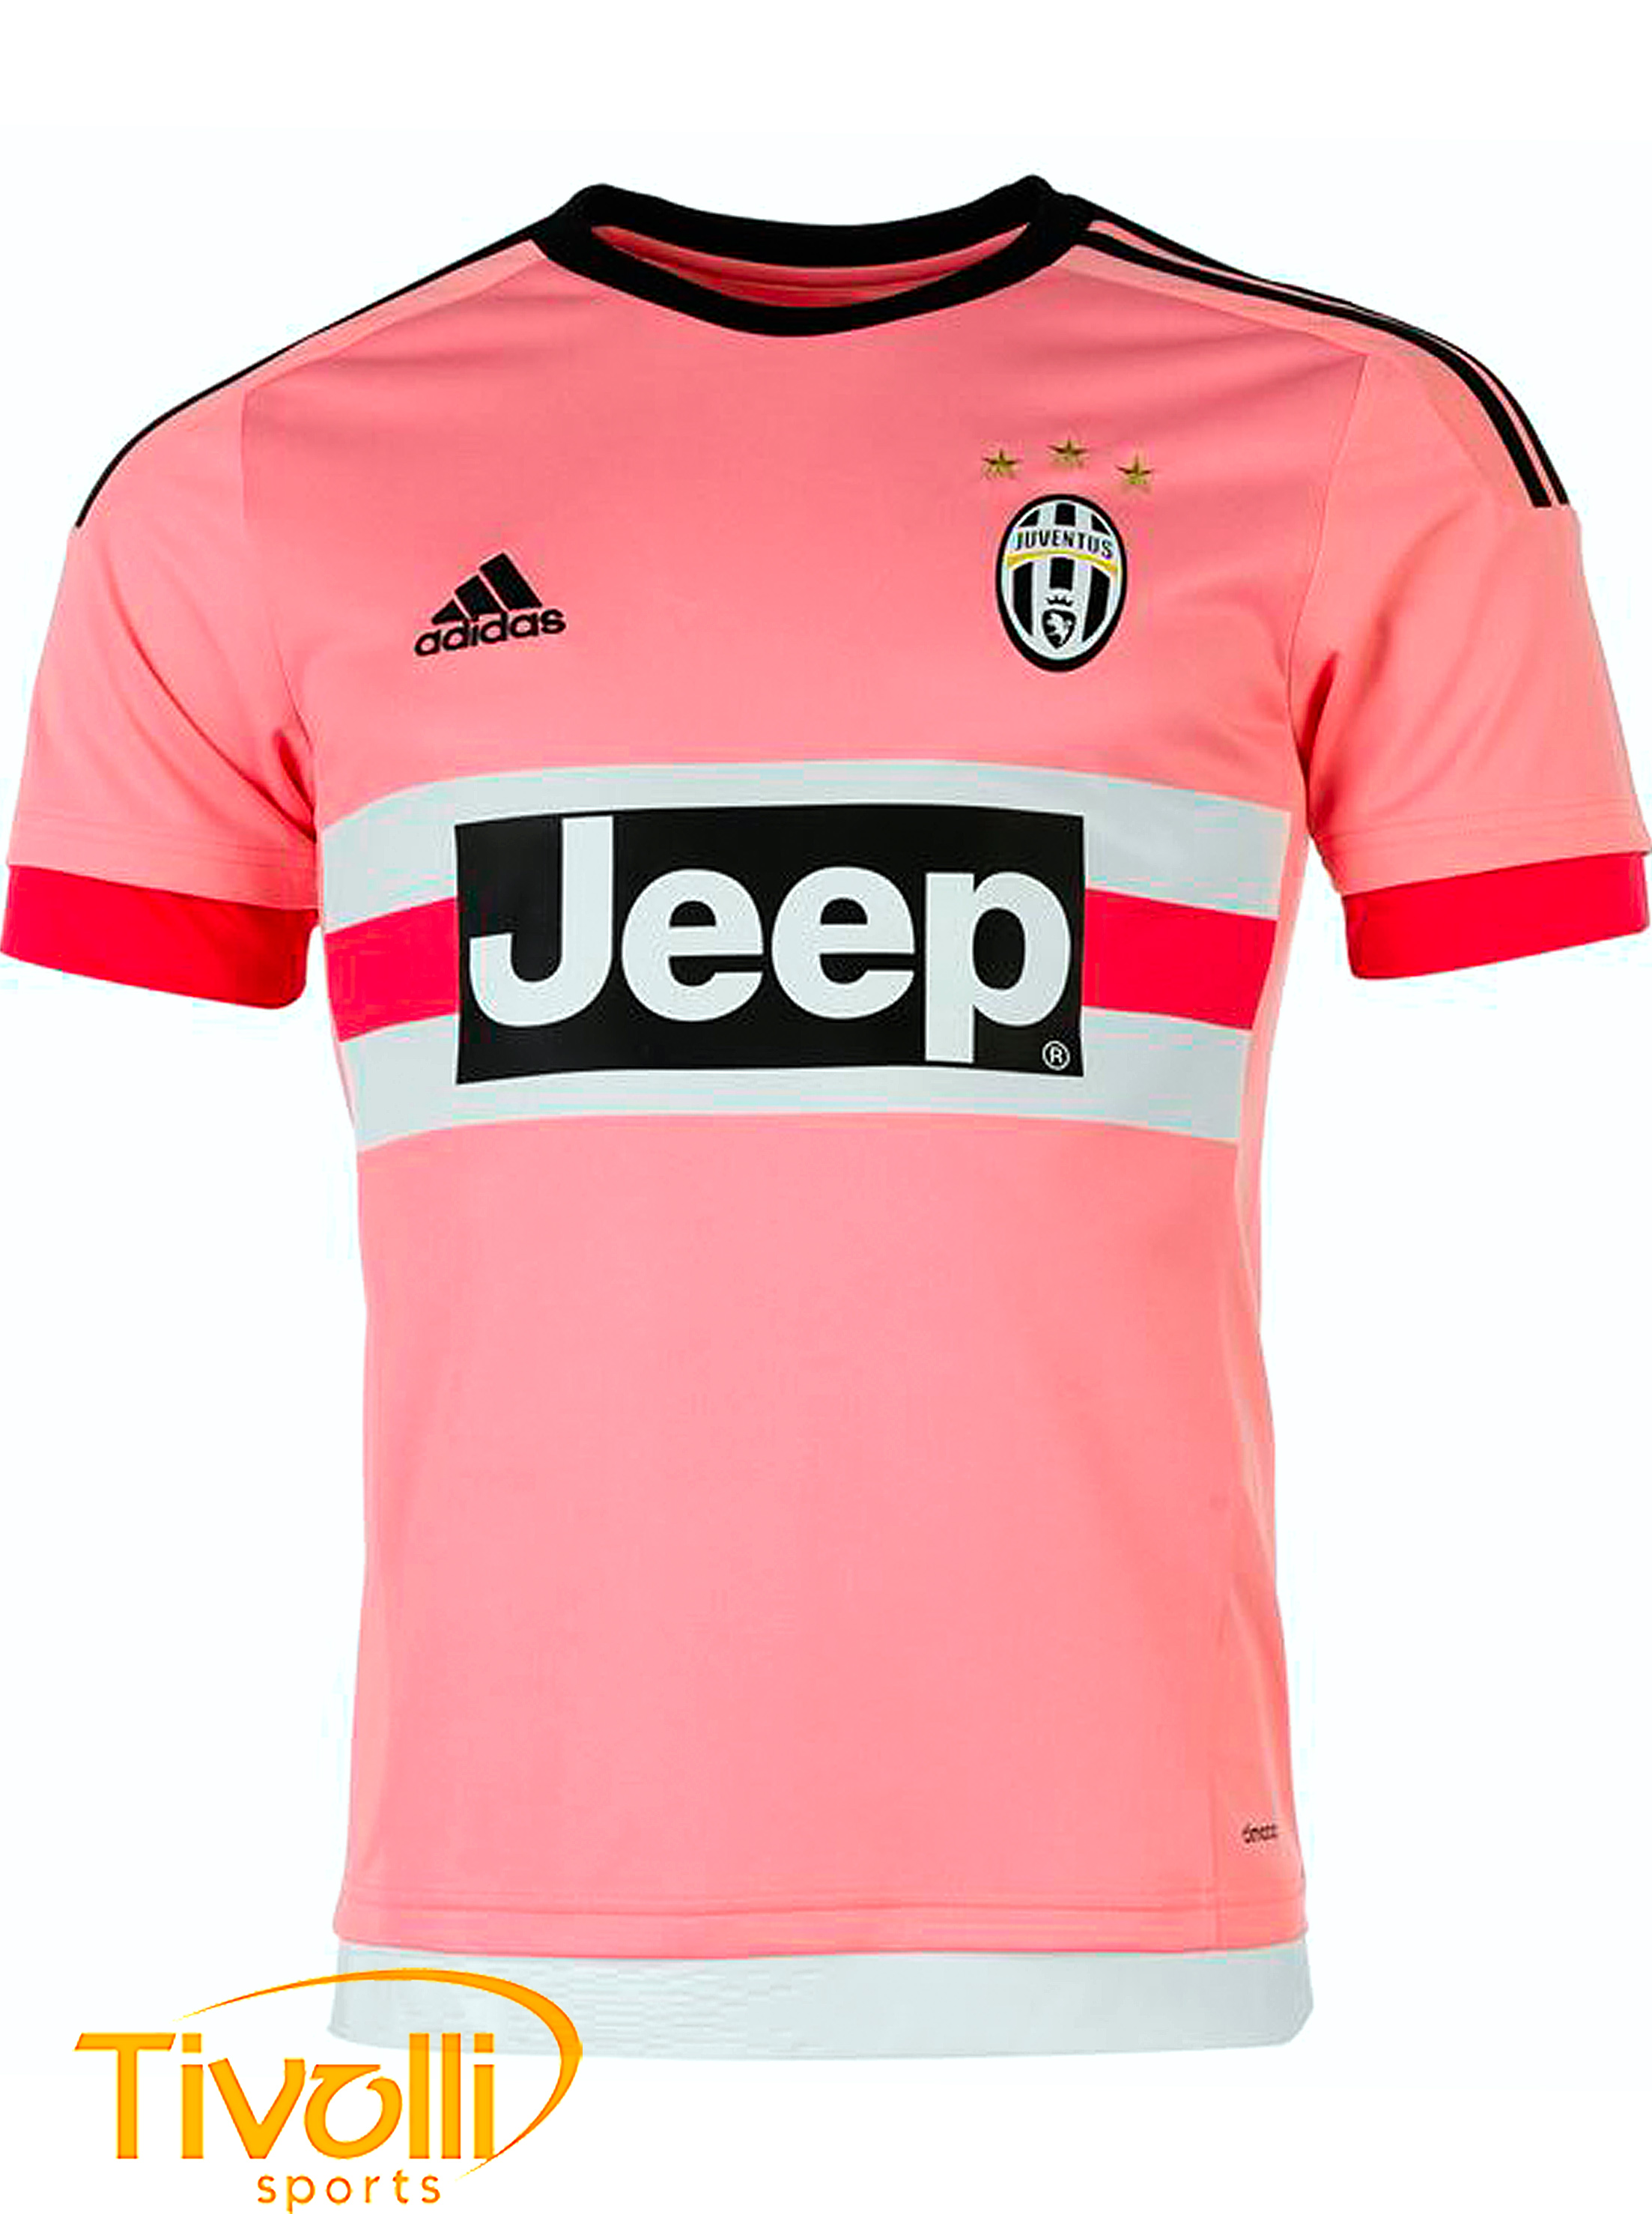 dfb83ea38 Camisa Juventus II Adidas Infantil   - Mega Saldão